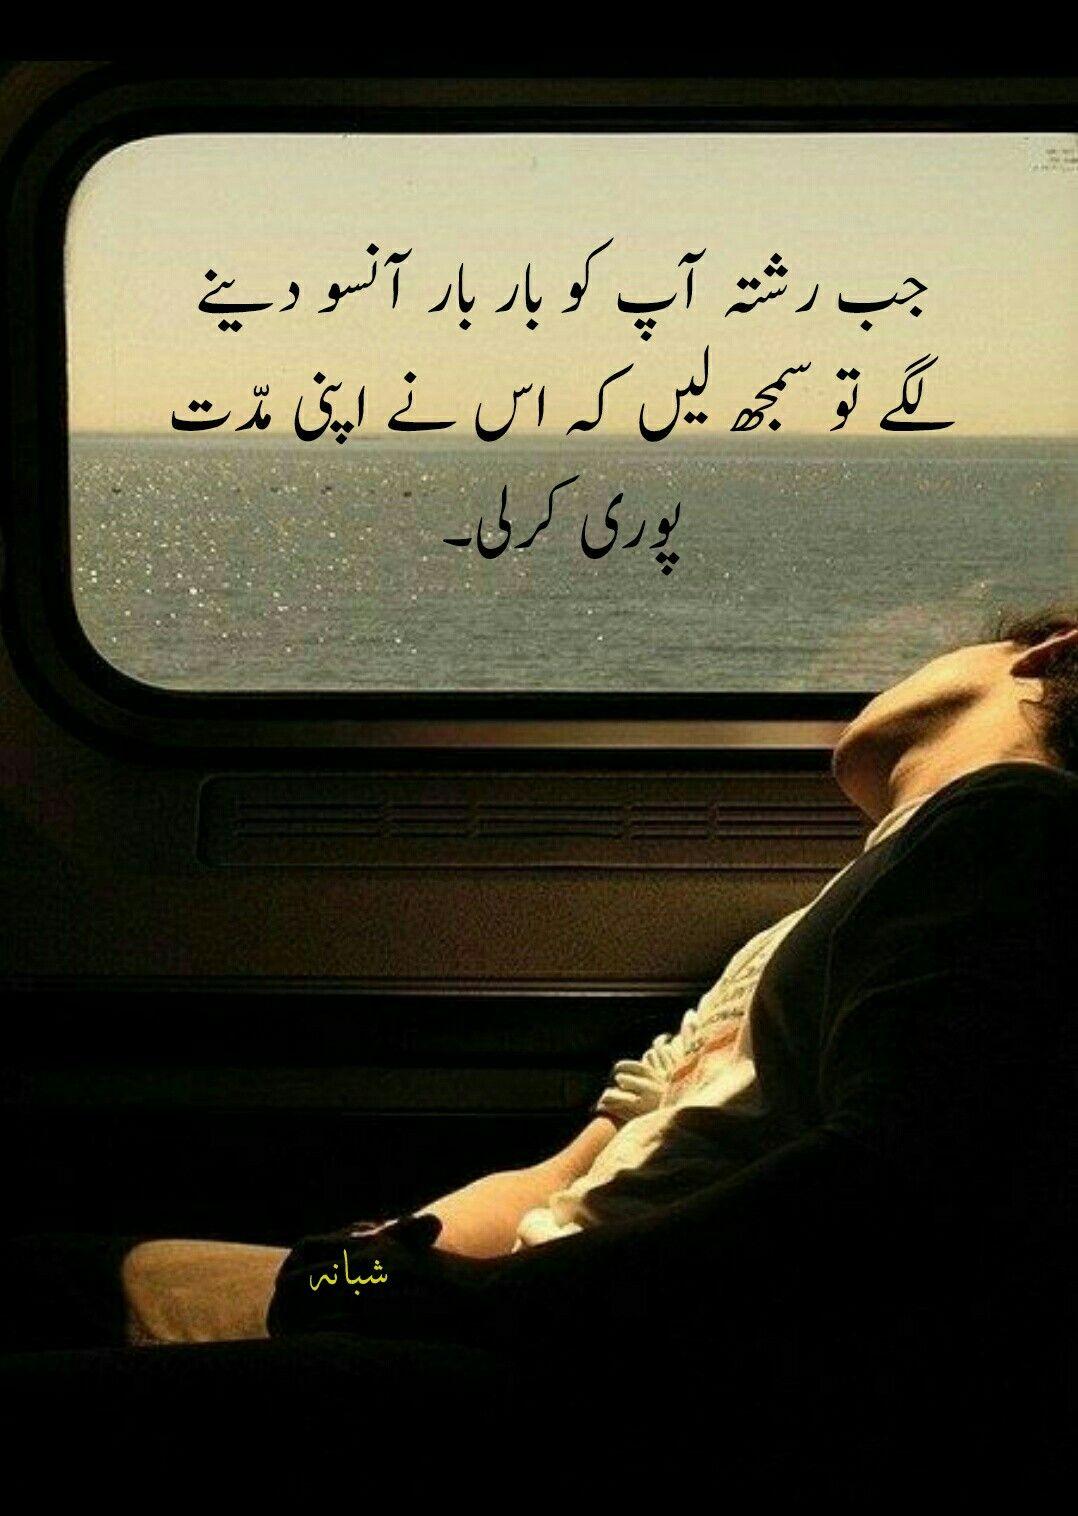 Krny Stock Quote Pinshabana On Waqt Ke Awraaق  Pinterest  Urdu Quotes Qoutes .